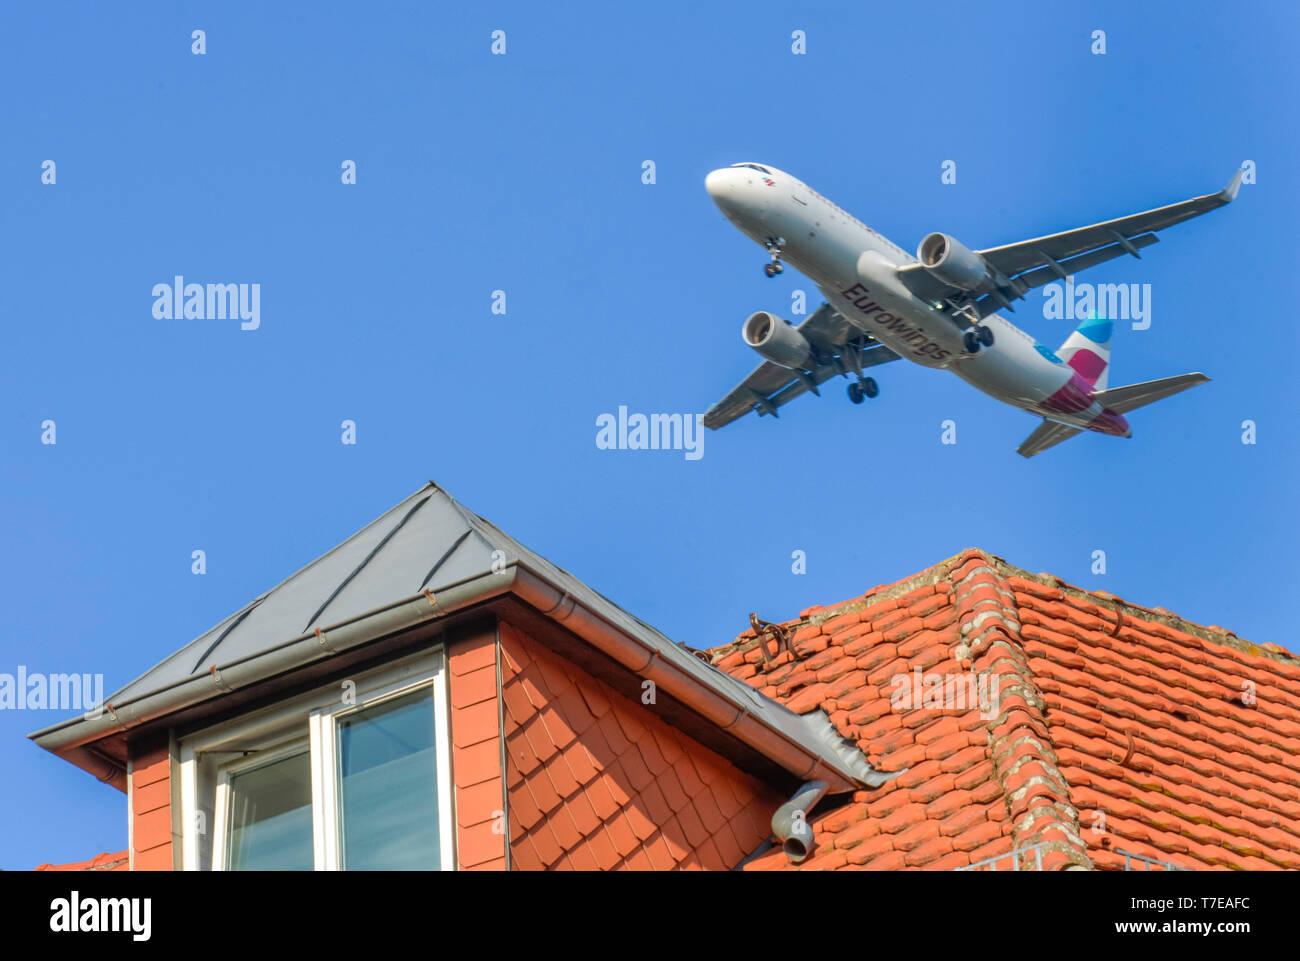 Eurowings, Flugzeug, Landeanflug, Tegel, Reinickendorf, Berlin, Deutschland - Stock Image